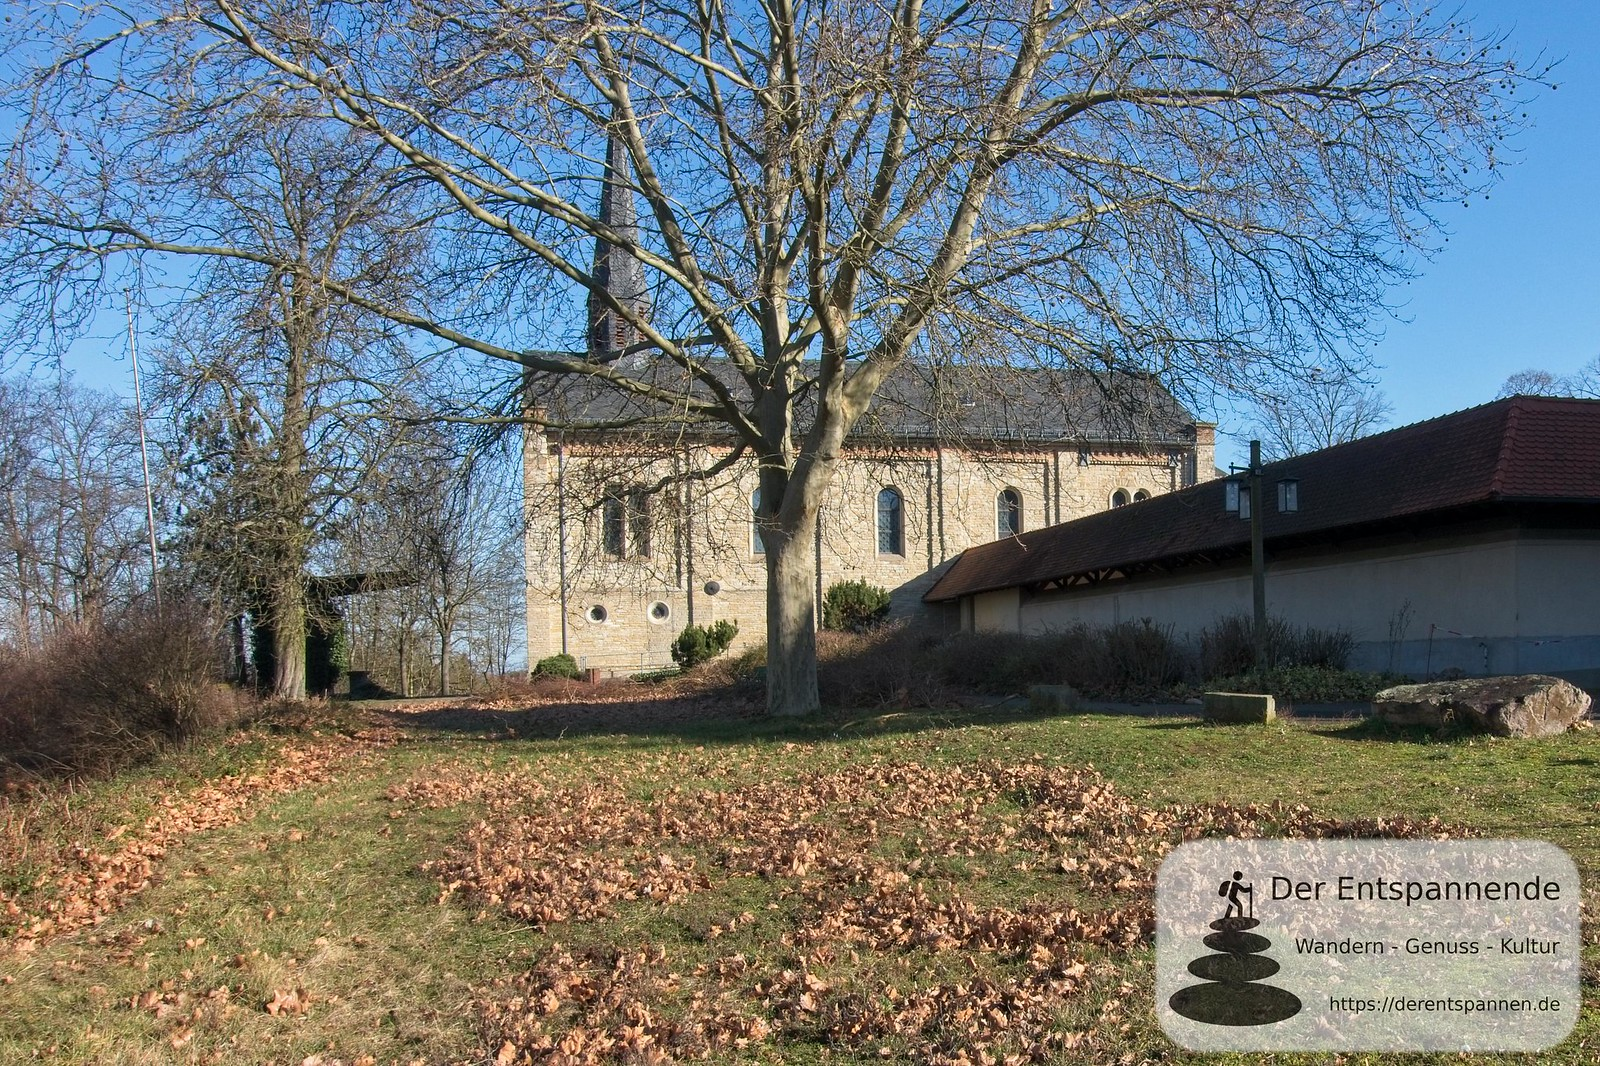 Vierzehn-Nothelfer-Kapelle auf dem Jakobsberg